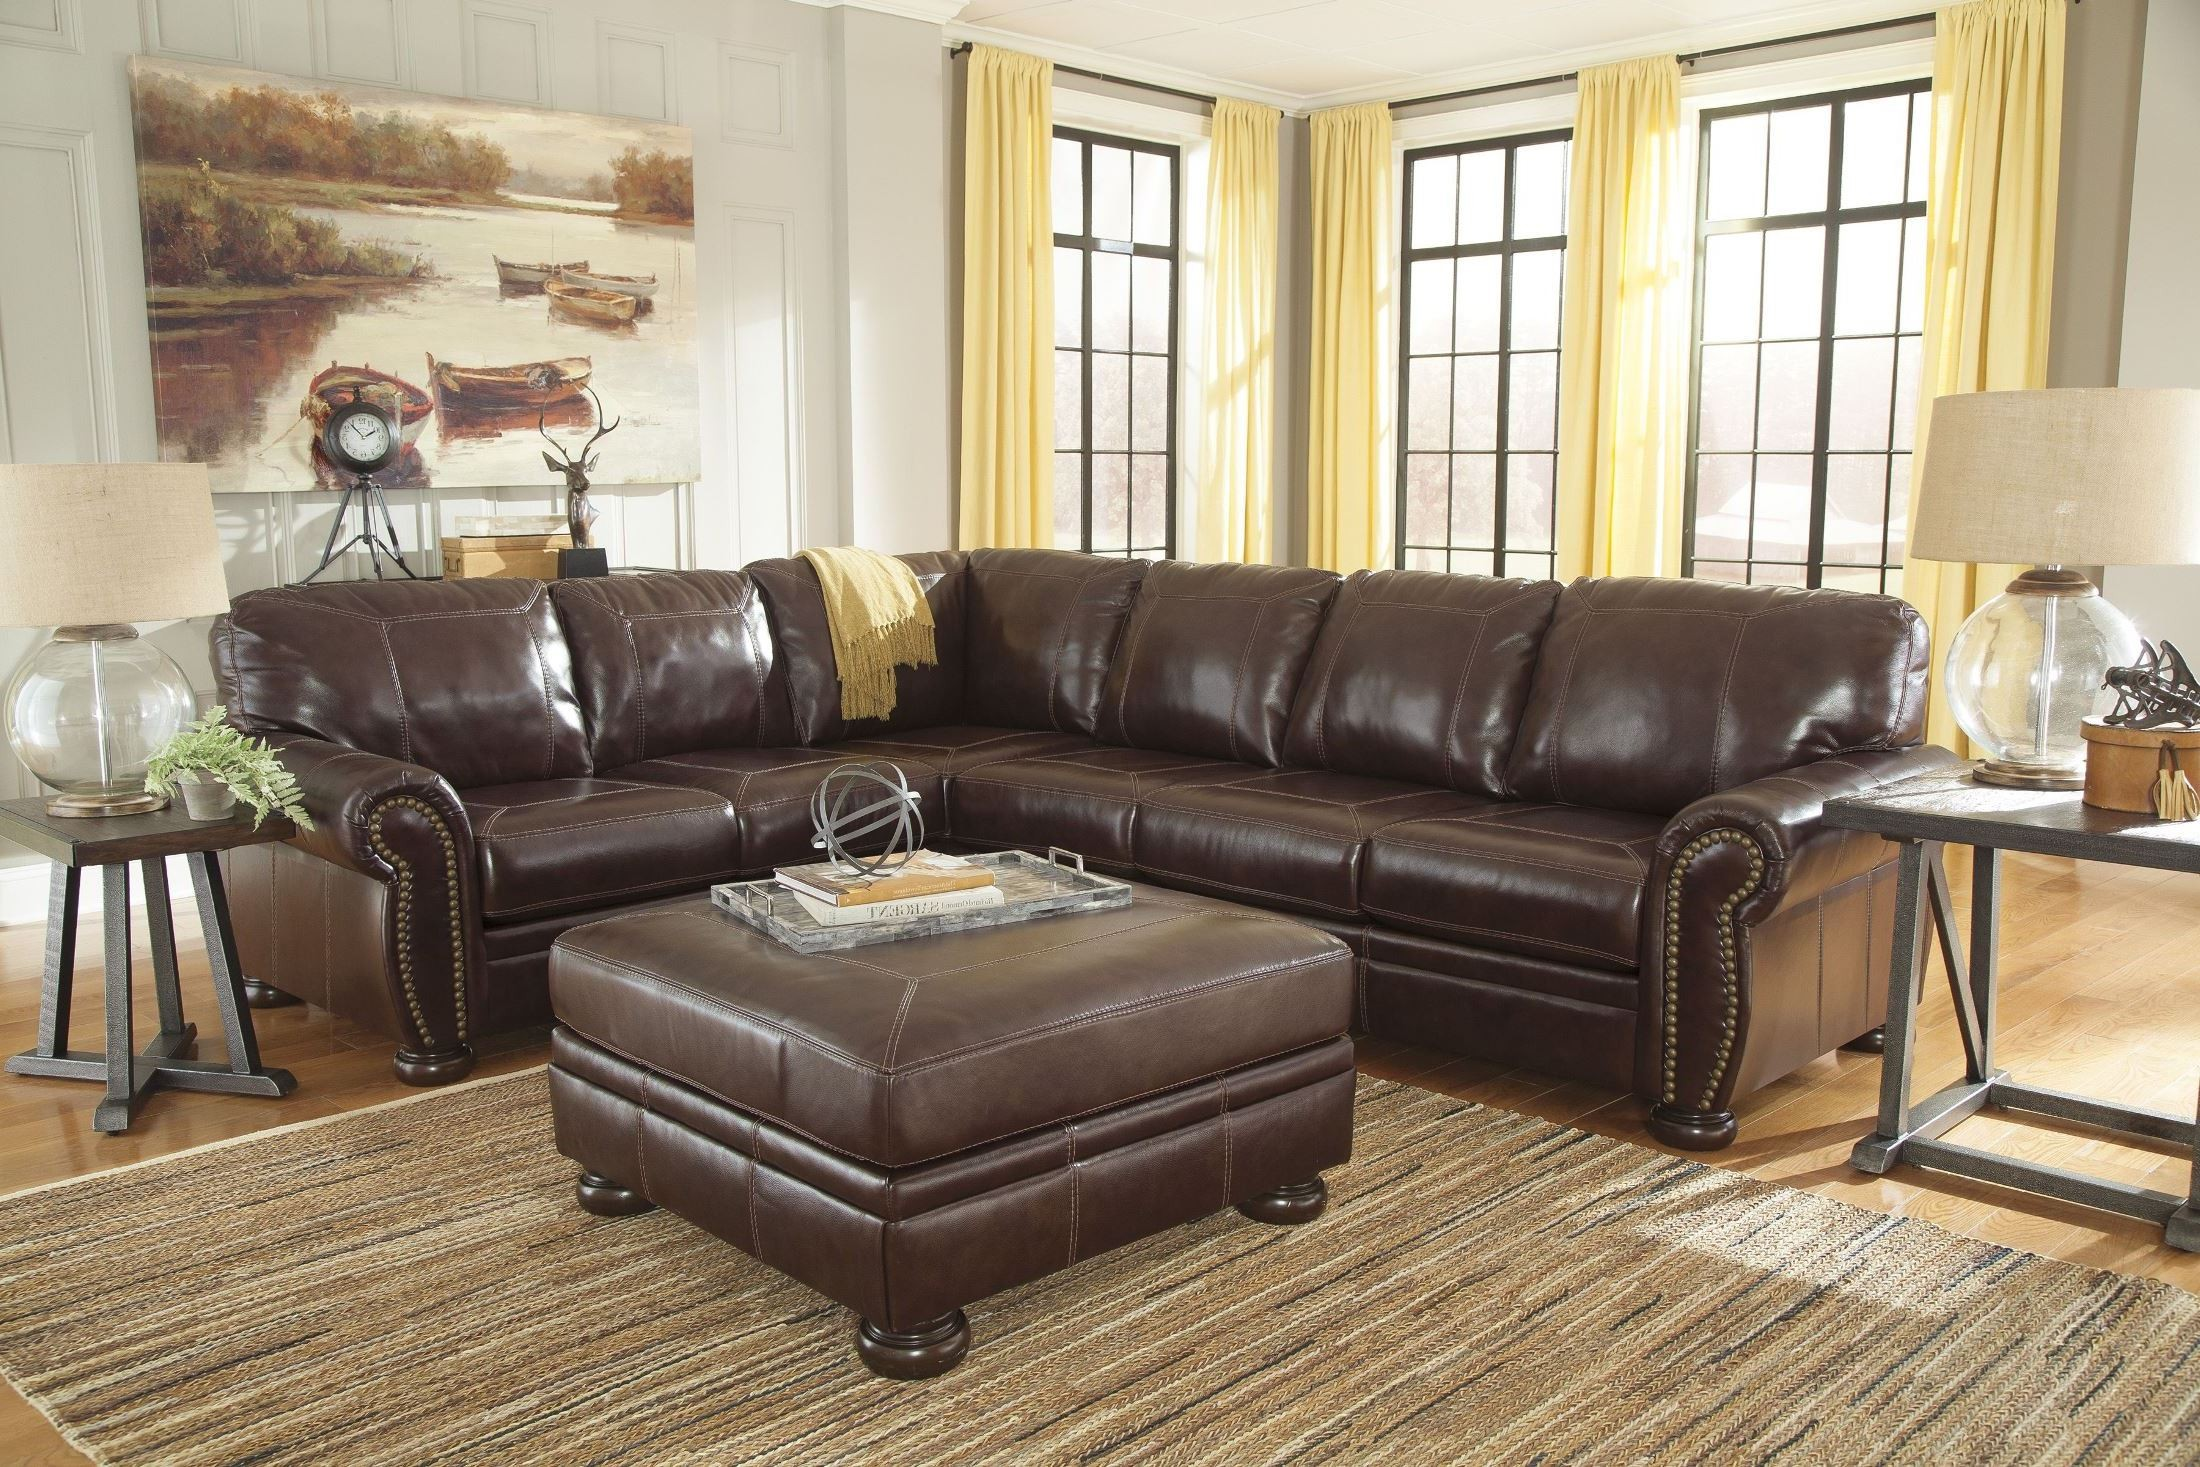 Banner Coffee Queen Sofa Sleeper from Ashley (5040439 ...